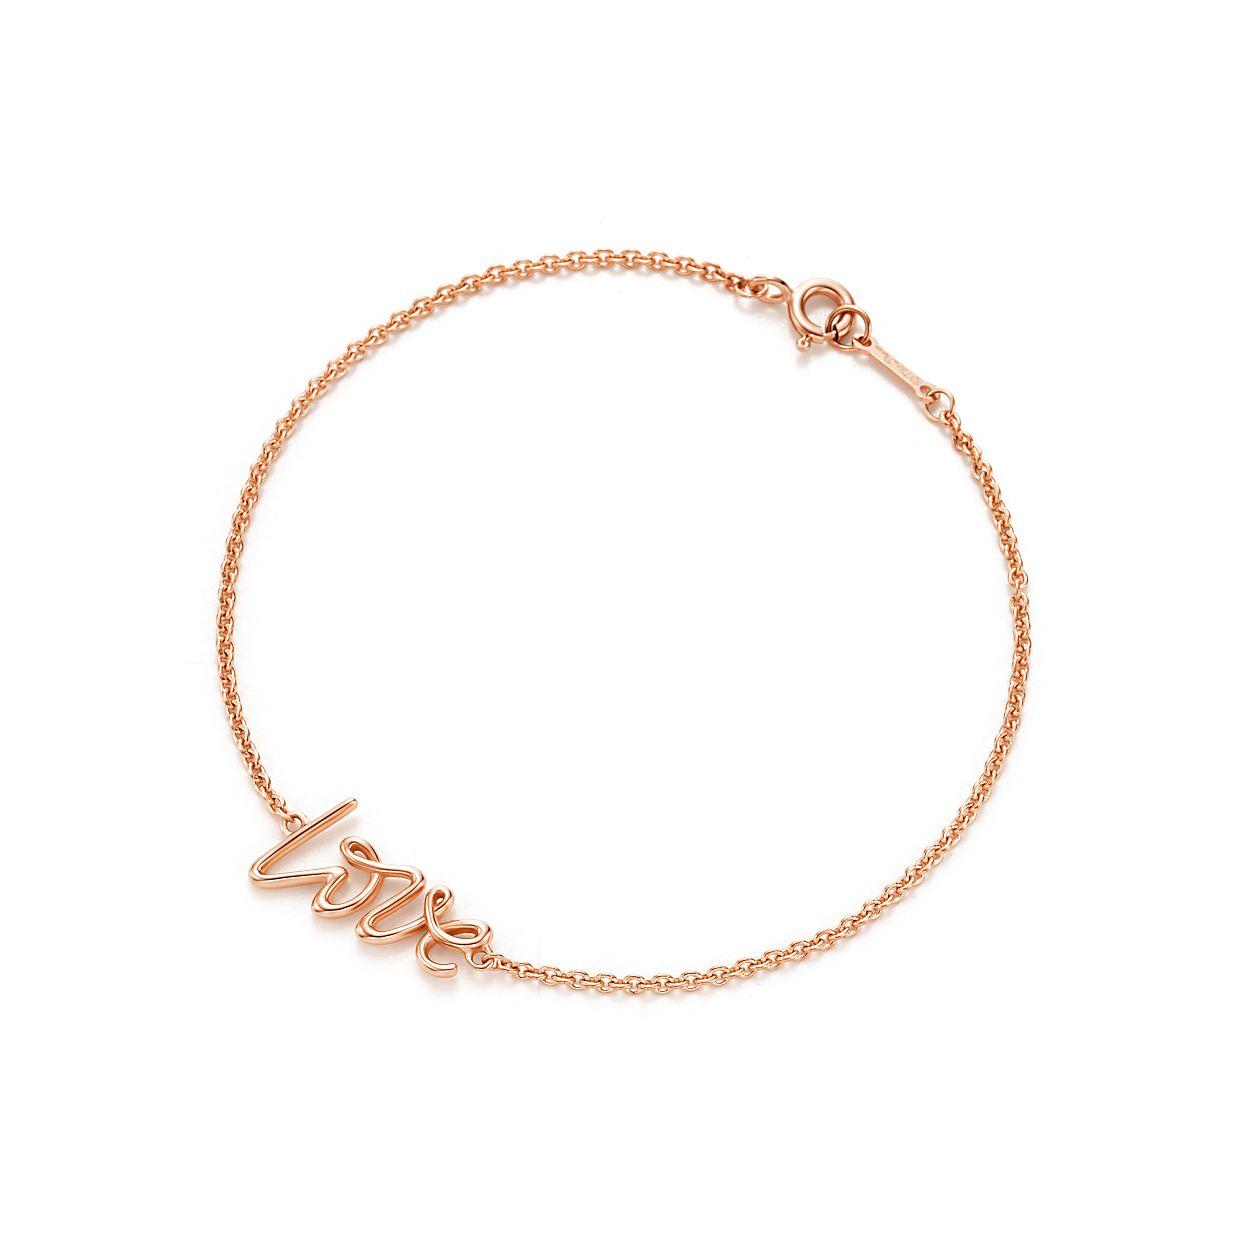 Paloma S Graffiti Love Bracelet